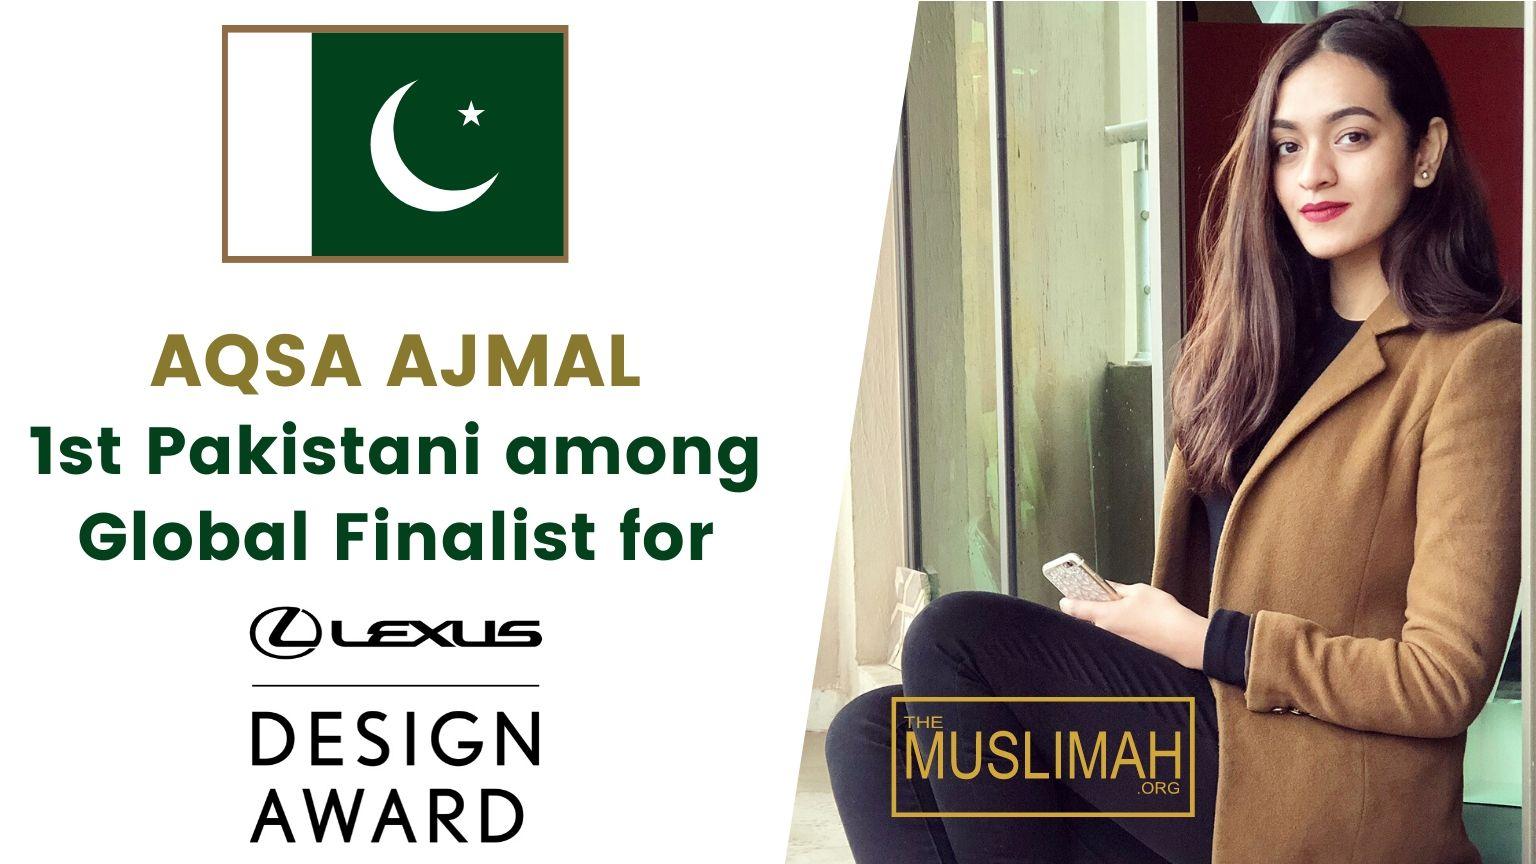 🇵🇰 Aqsa Ajmal becomes 1st Pakistani amongst Global Finalists for Lexus Design Award 2020 🏆